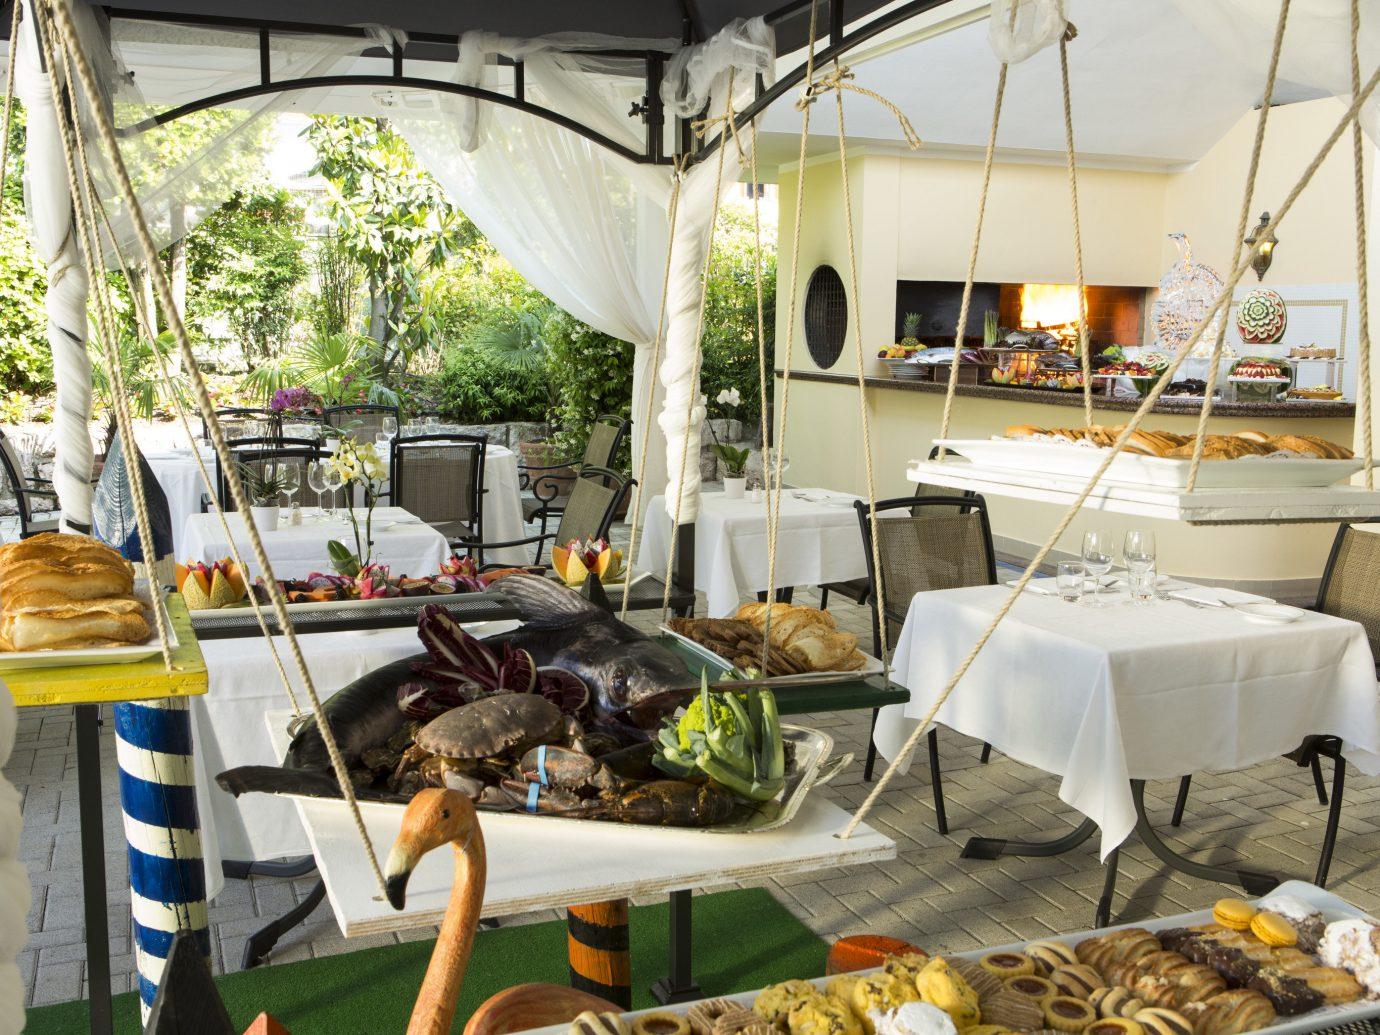 All-Inclusive Resorts Hotels brunch food table restaurant interior design